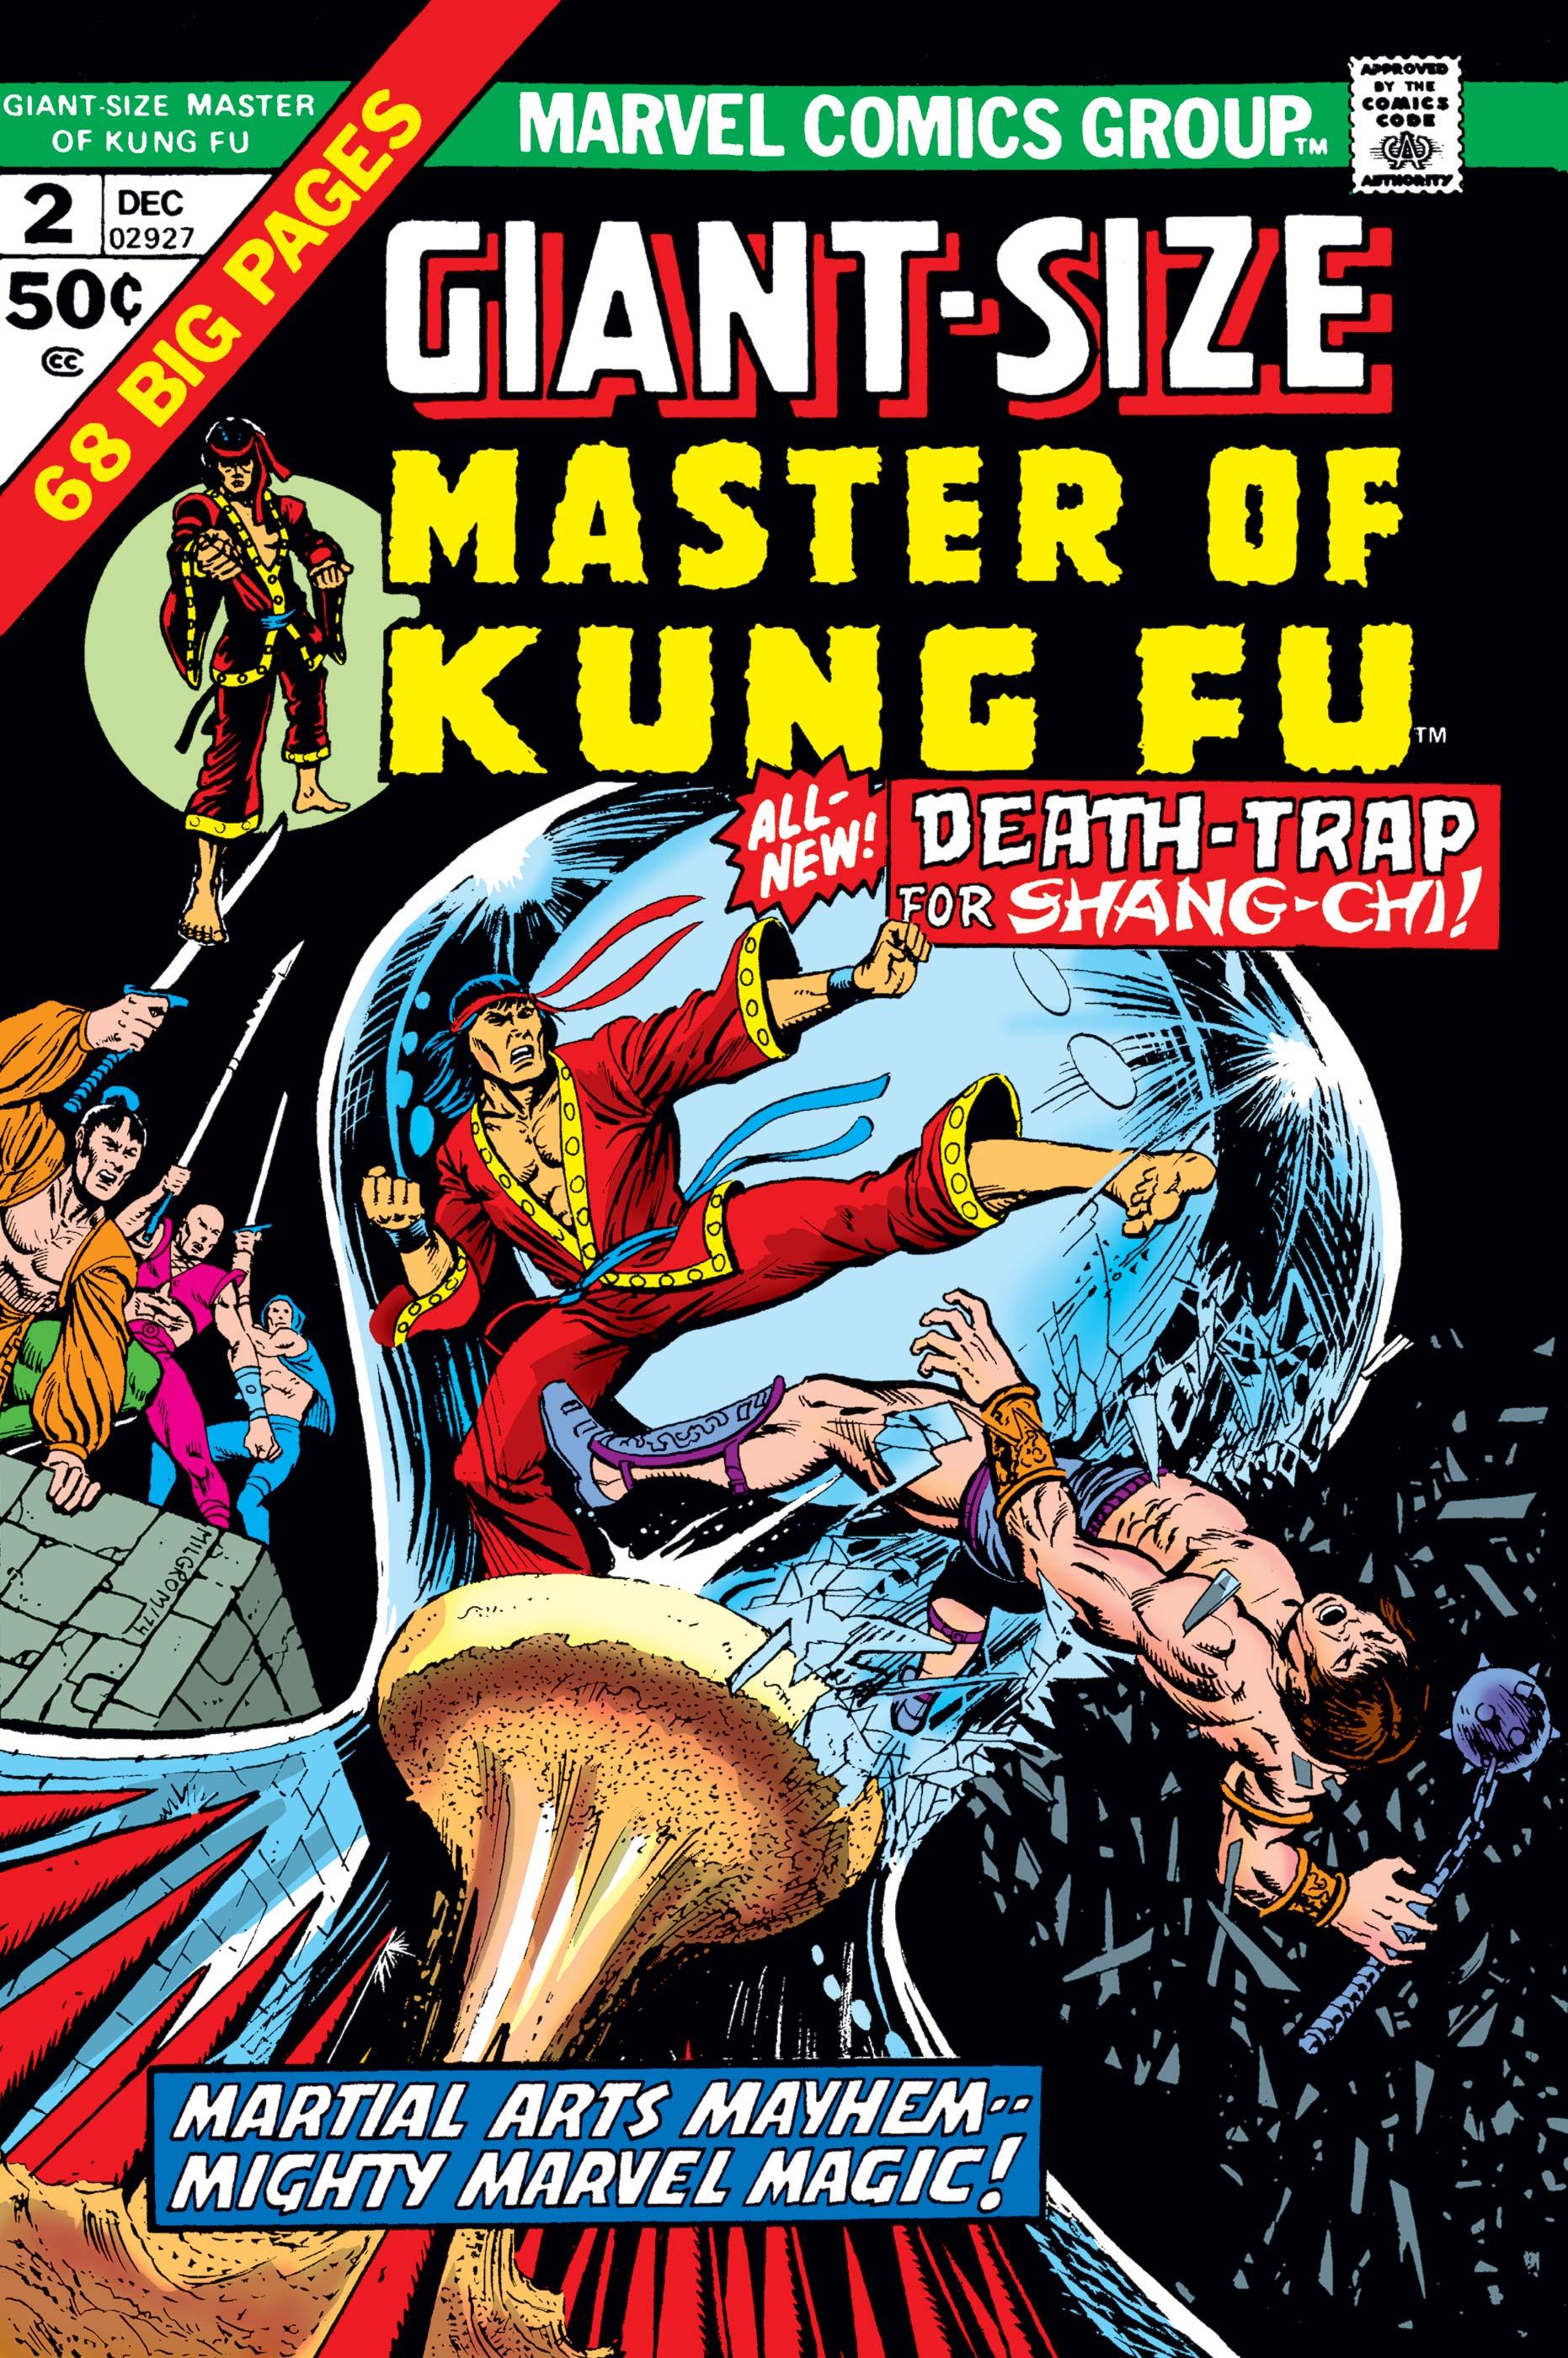 Giant-Size Master of Kung Fu (1974) #2